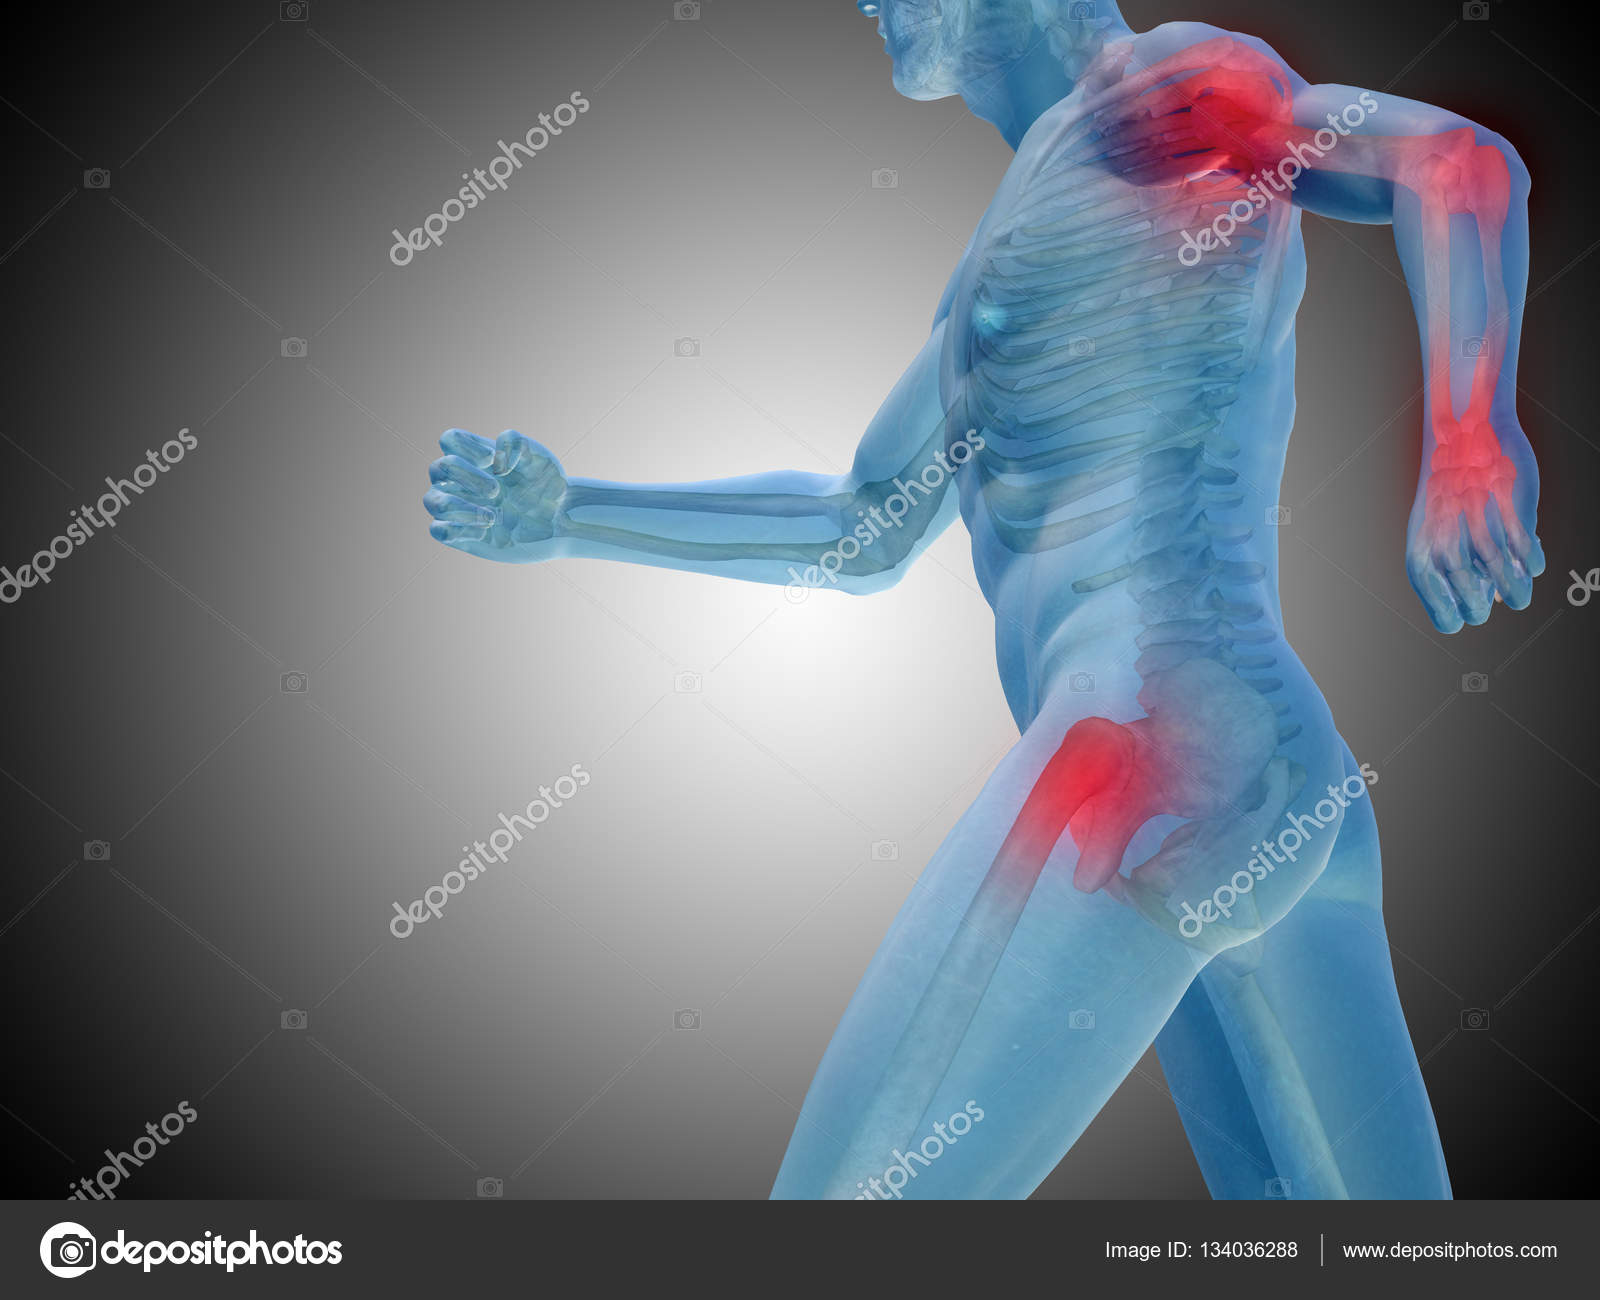 anatomía humana sobre fondo gris — Foto de stock © design36 #134036288